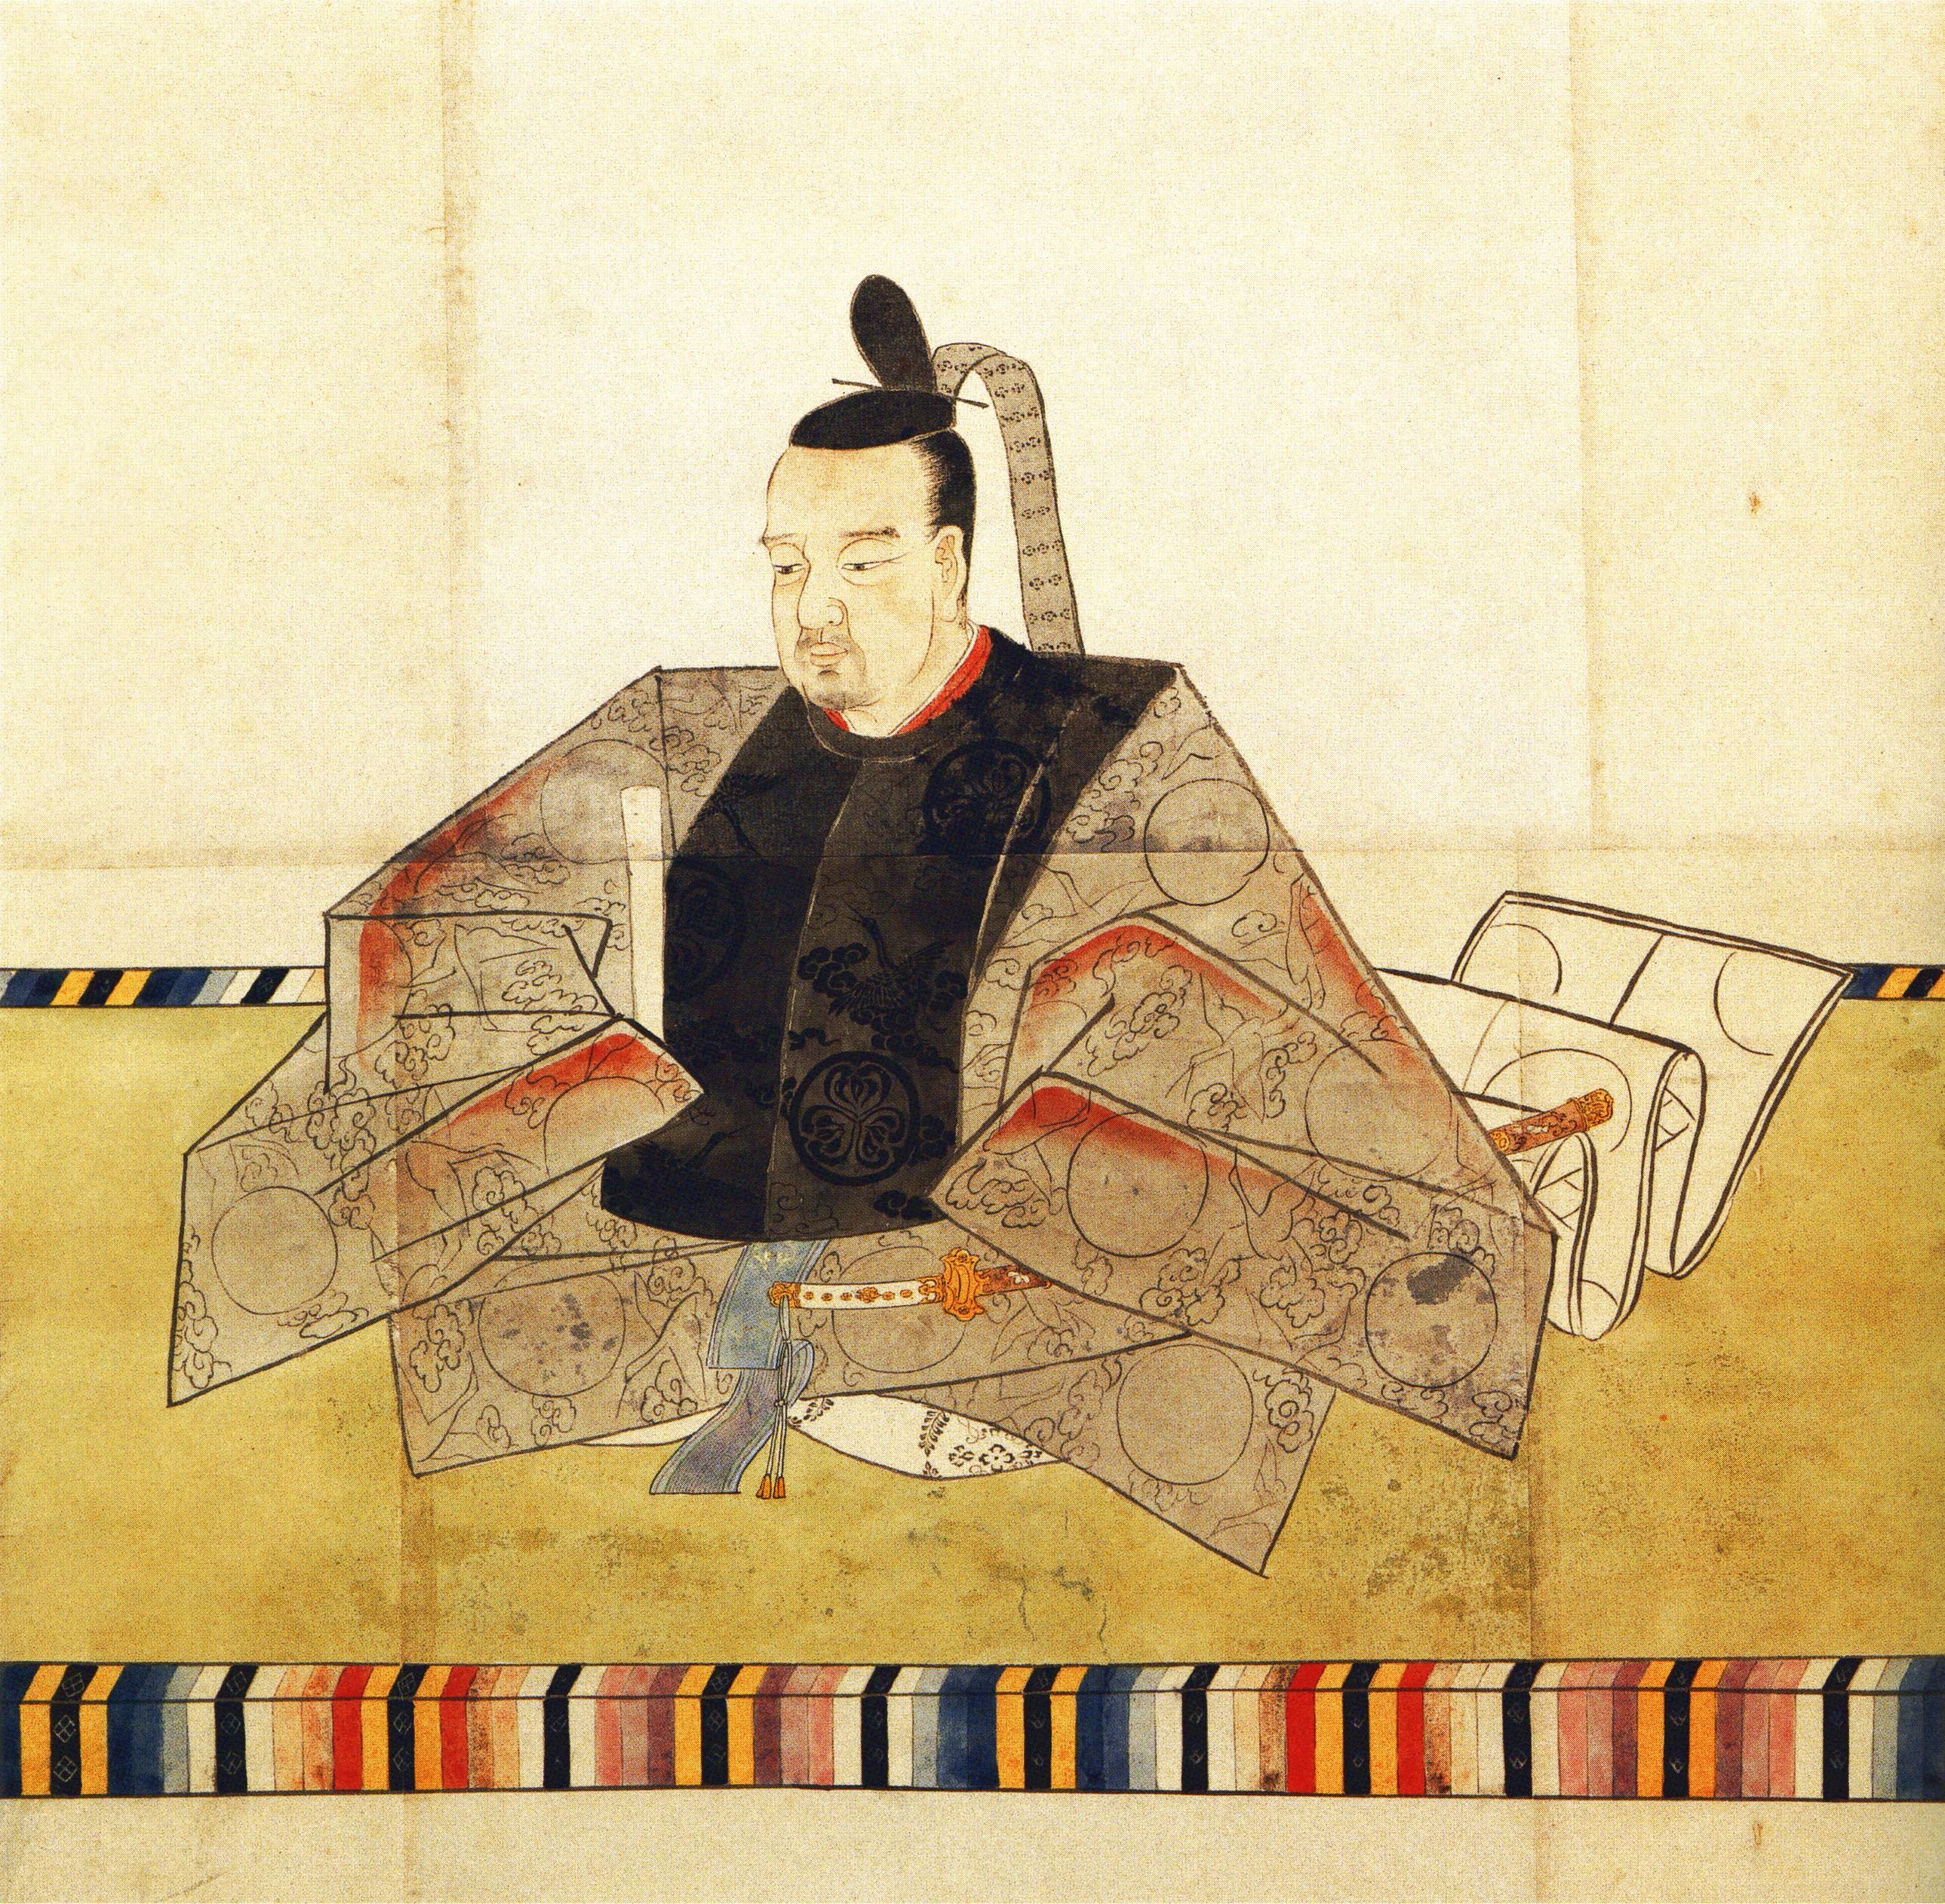 徳川家斉 - Wikipedia